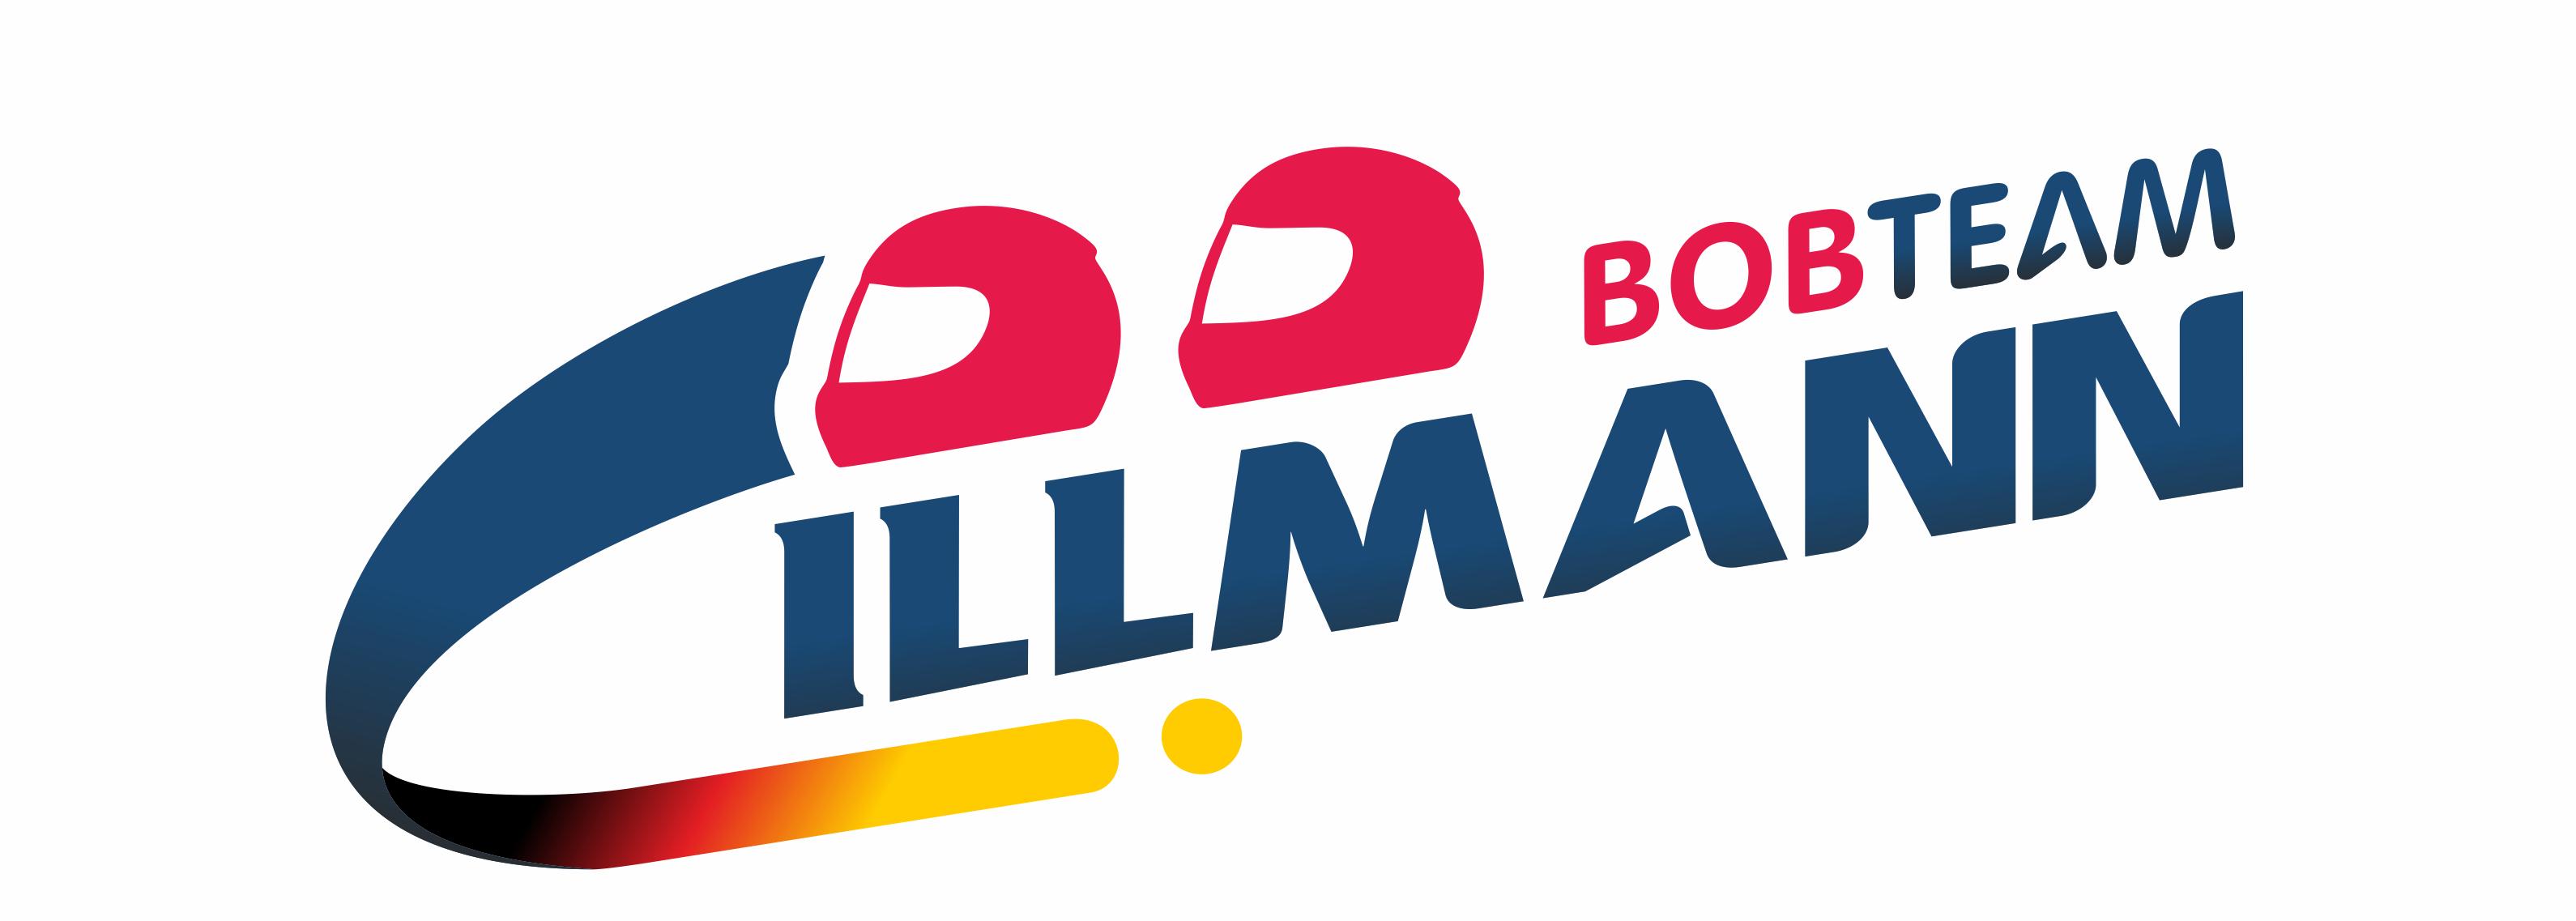 logo_bobteam_illmann_endfassung_weißerHG